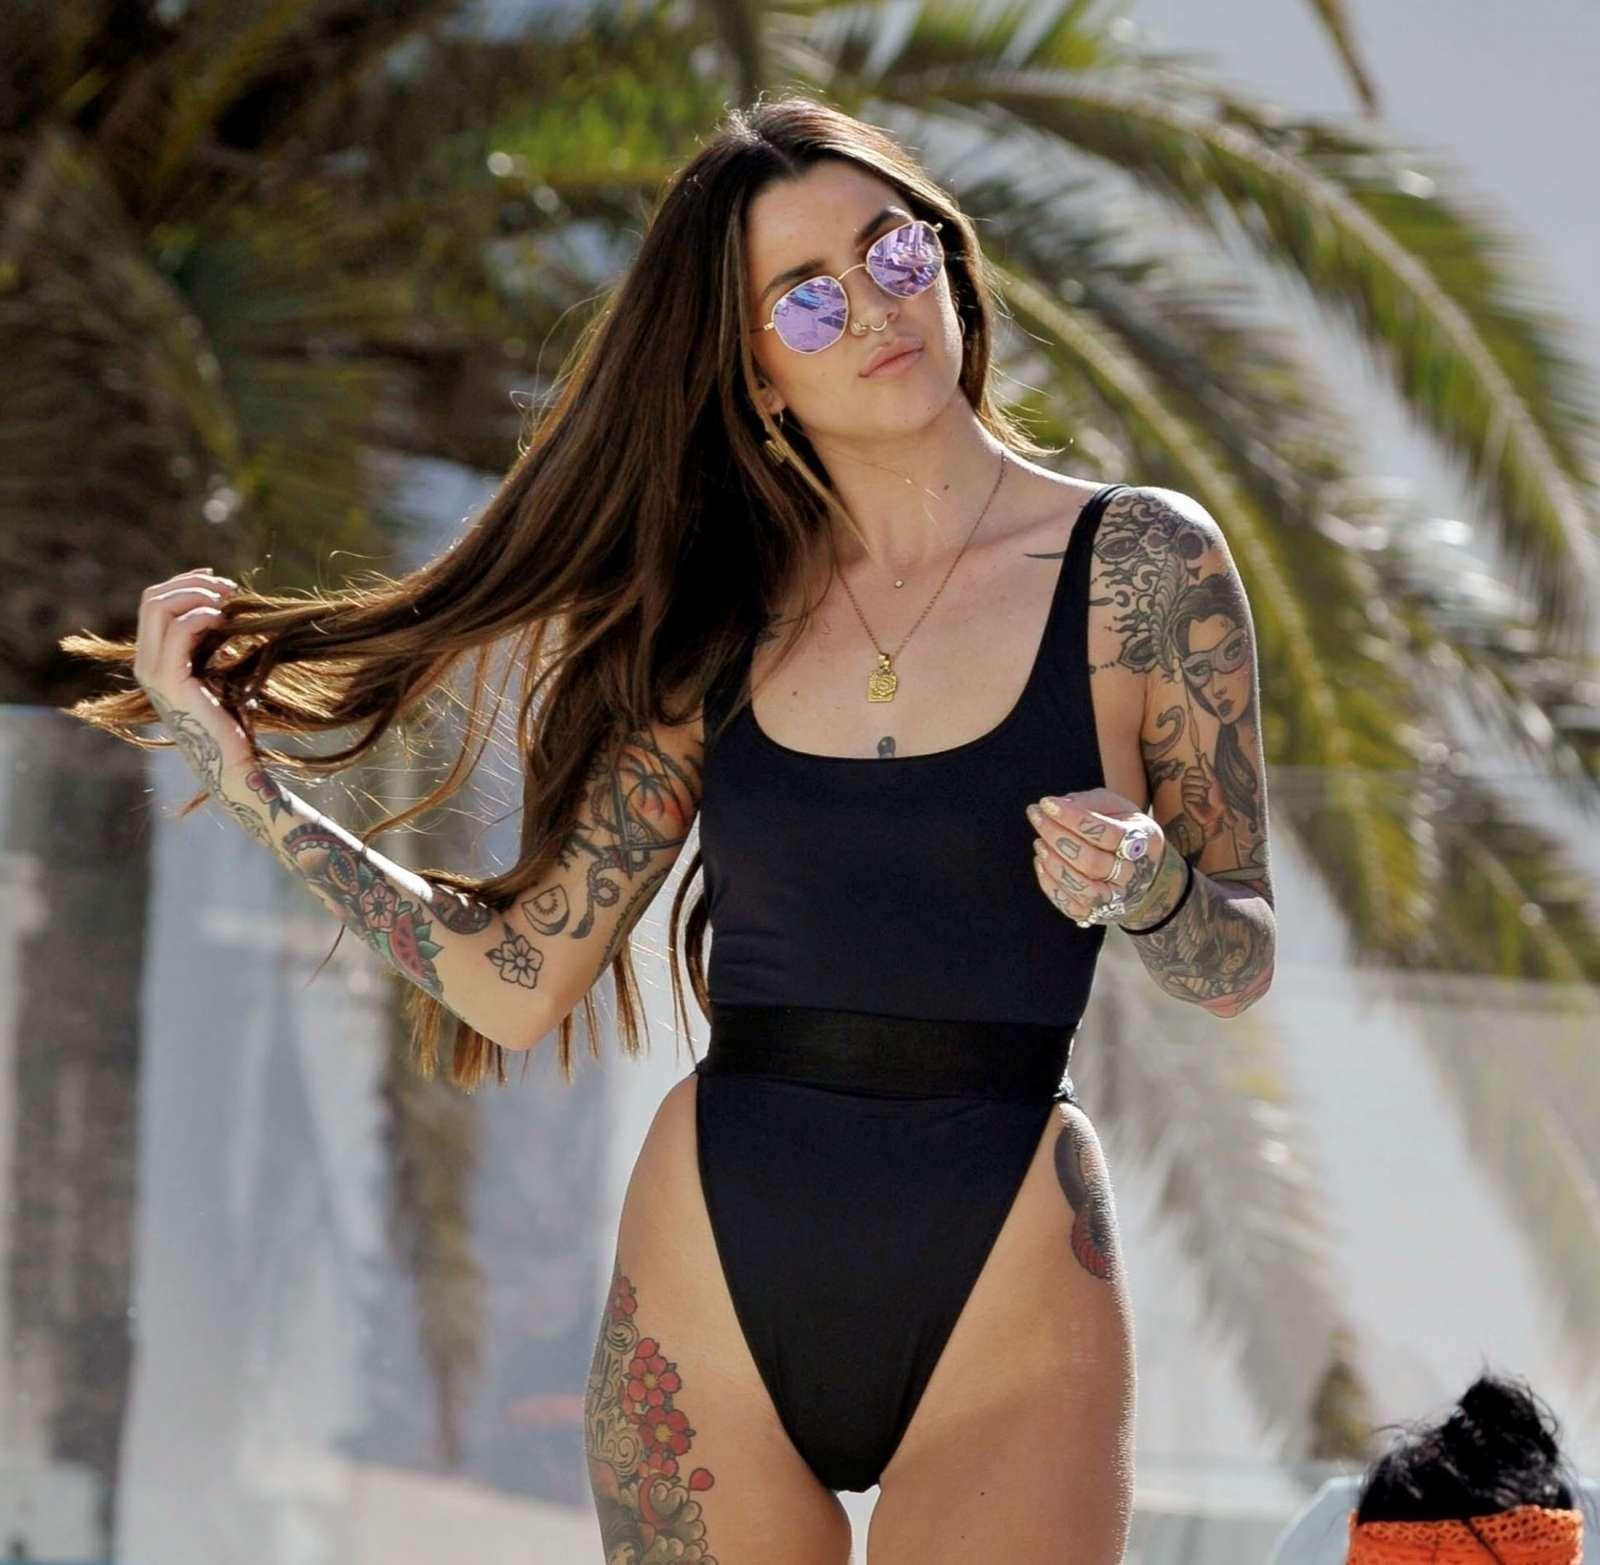 Darylle Sargeant nudes (47 photo), Sexy, Bikini, Boobs, cameltoe 2017